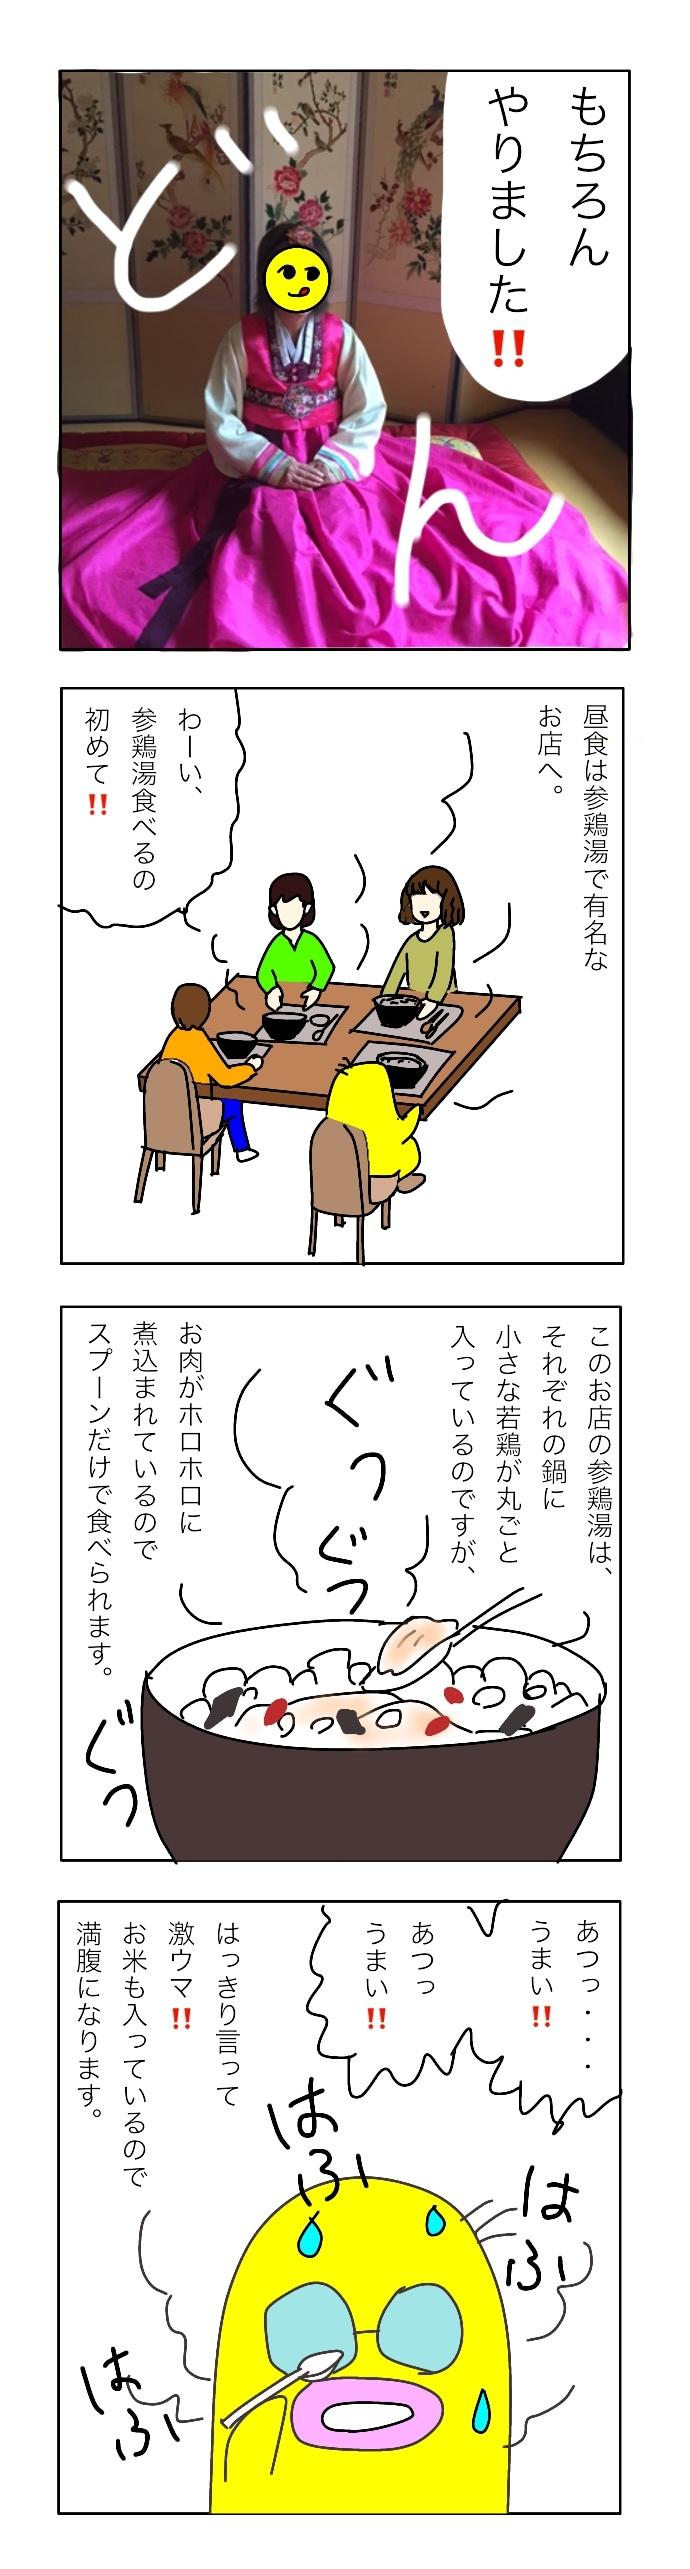 kankoku5 さむげたん